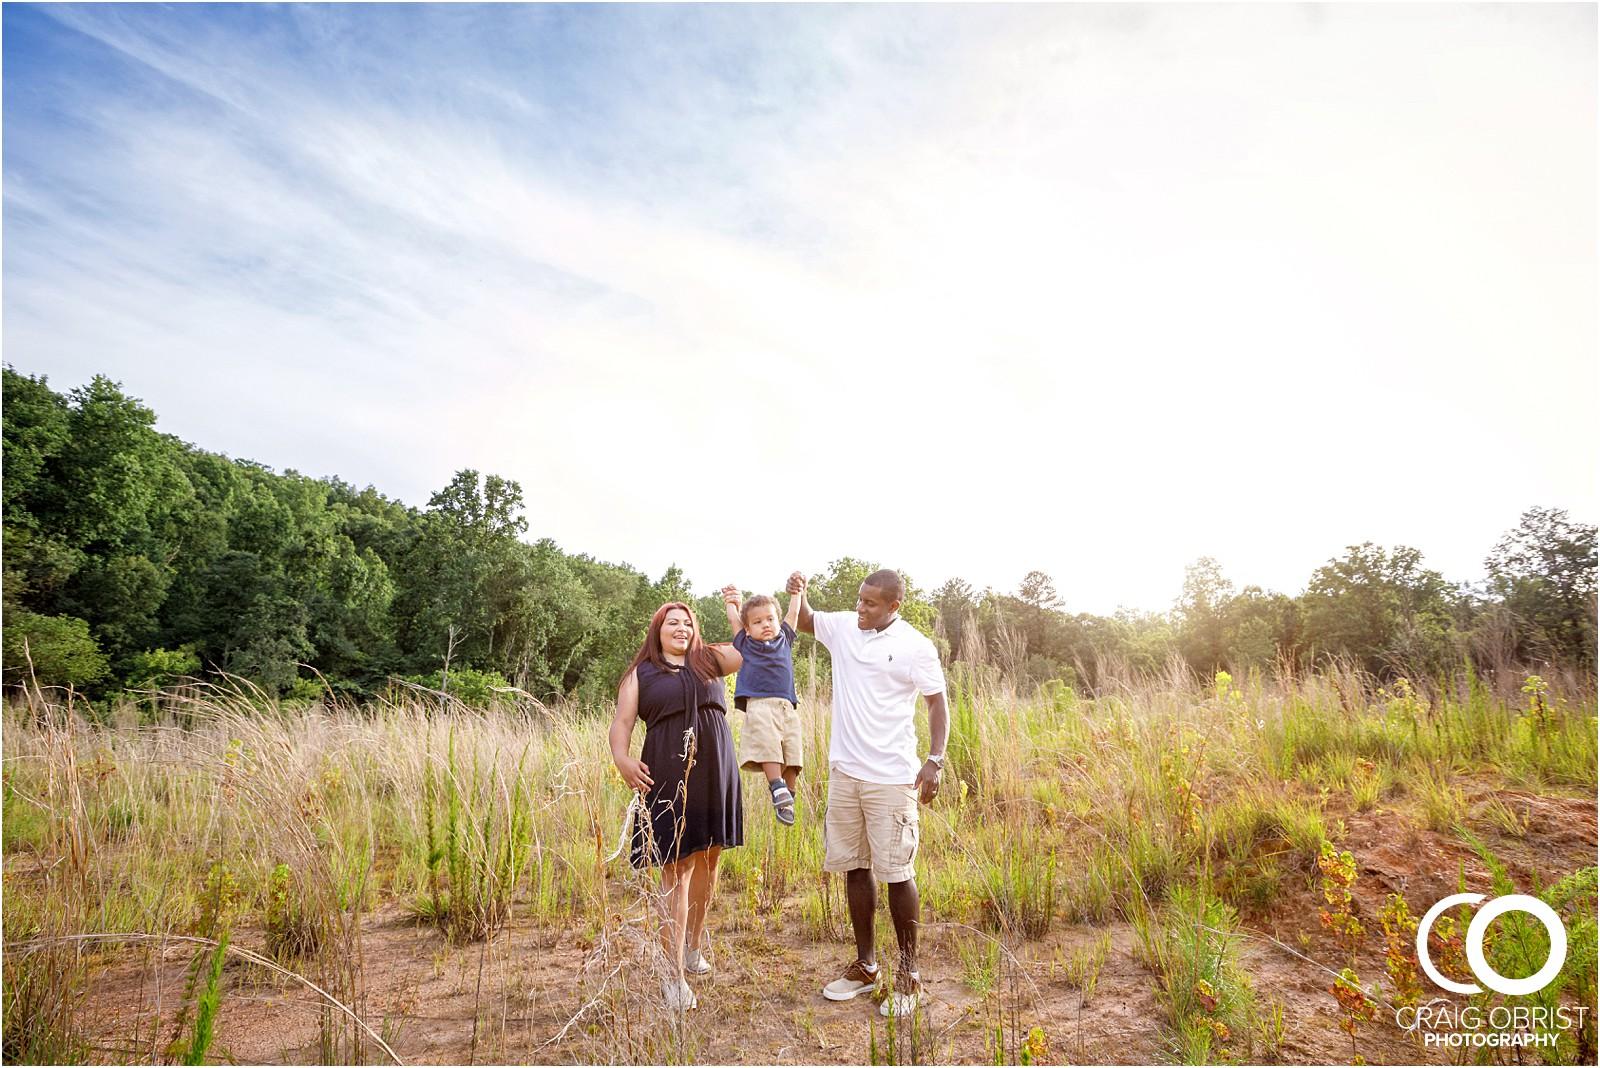 Grass Field Family Portratis Sunset Atlanta_0033.jpg